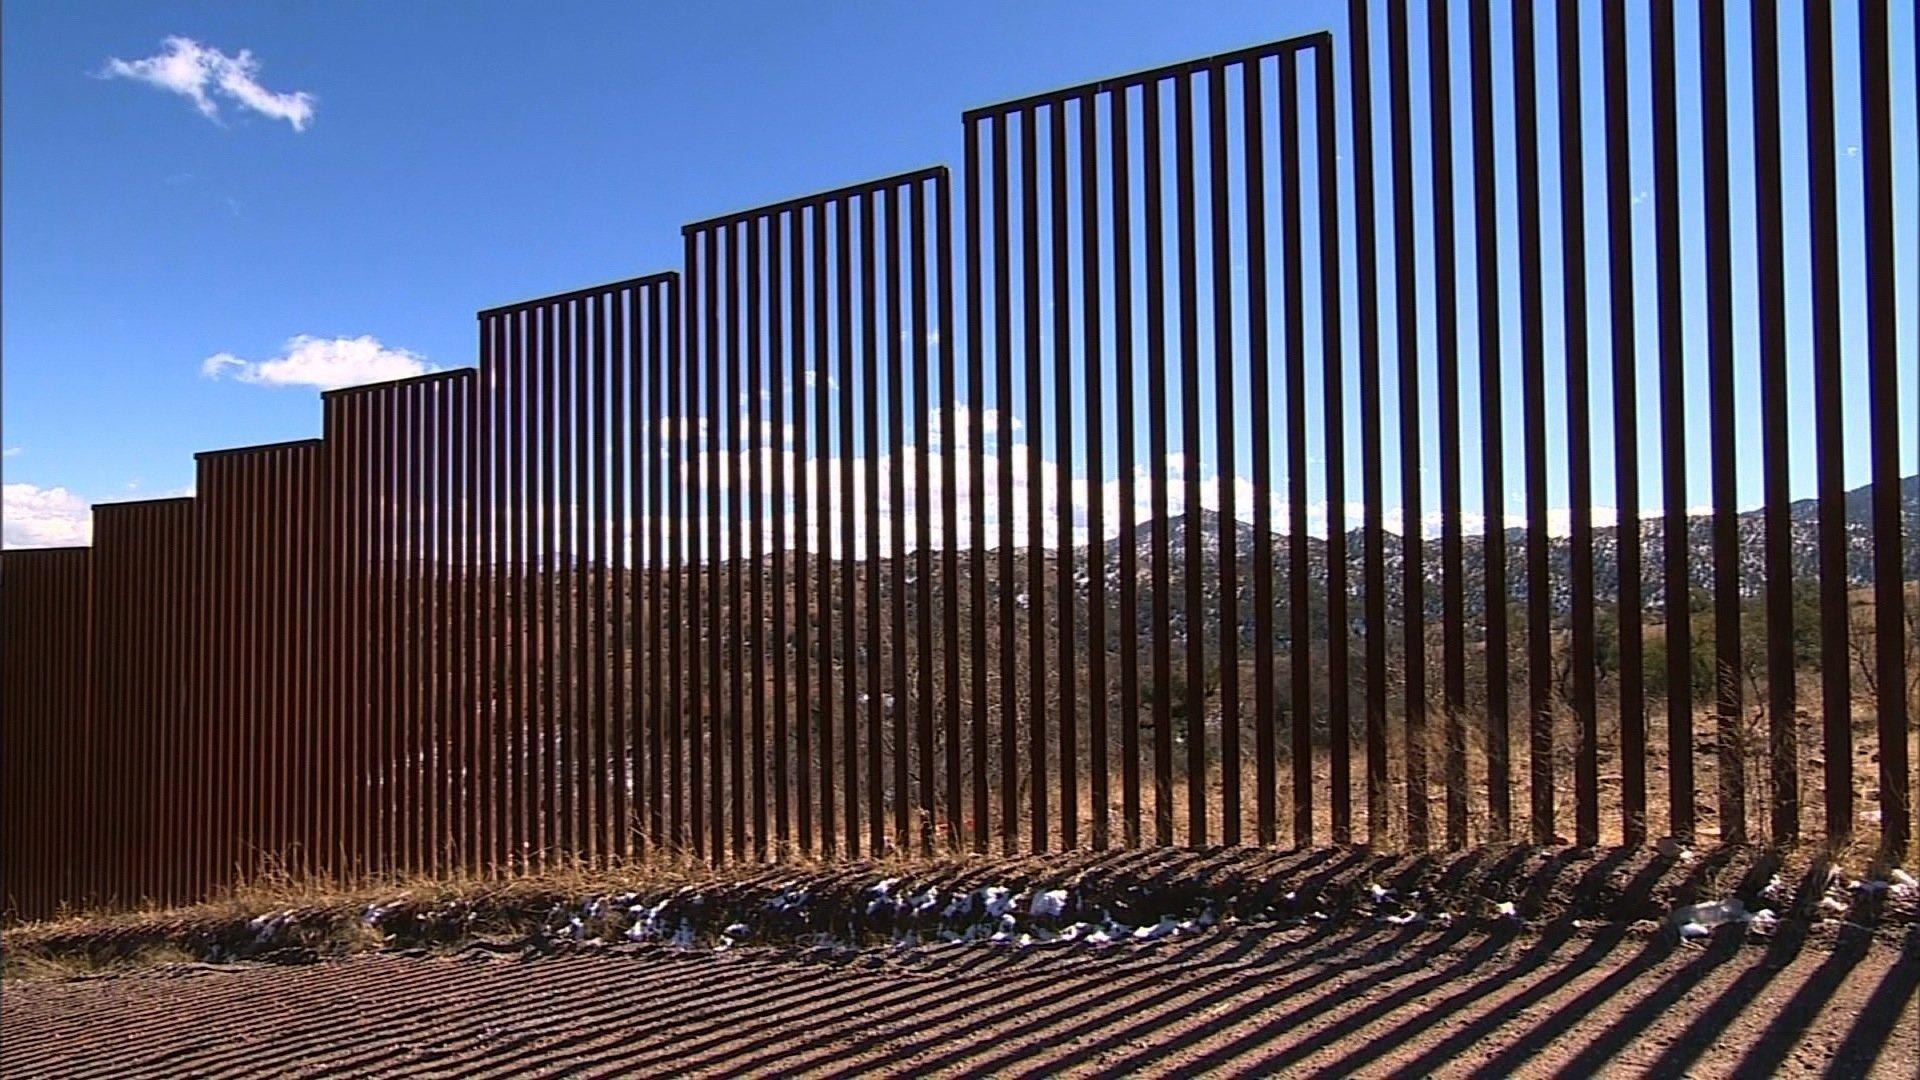 A section of the U.S-Mexico border fence separating Nogales Arizona and Santa Cruz Mexico